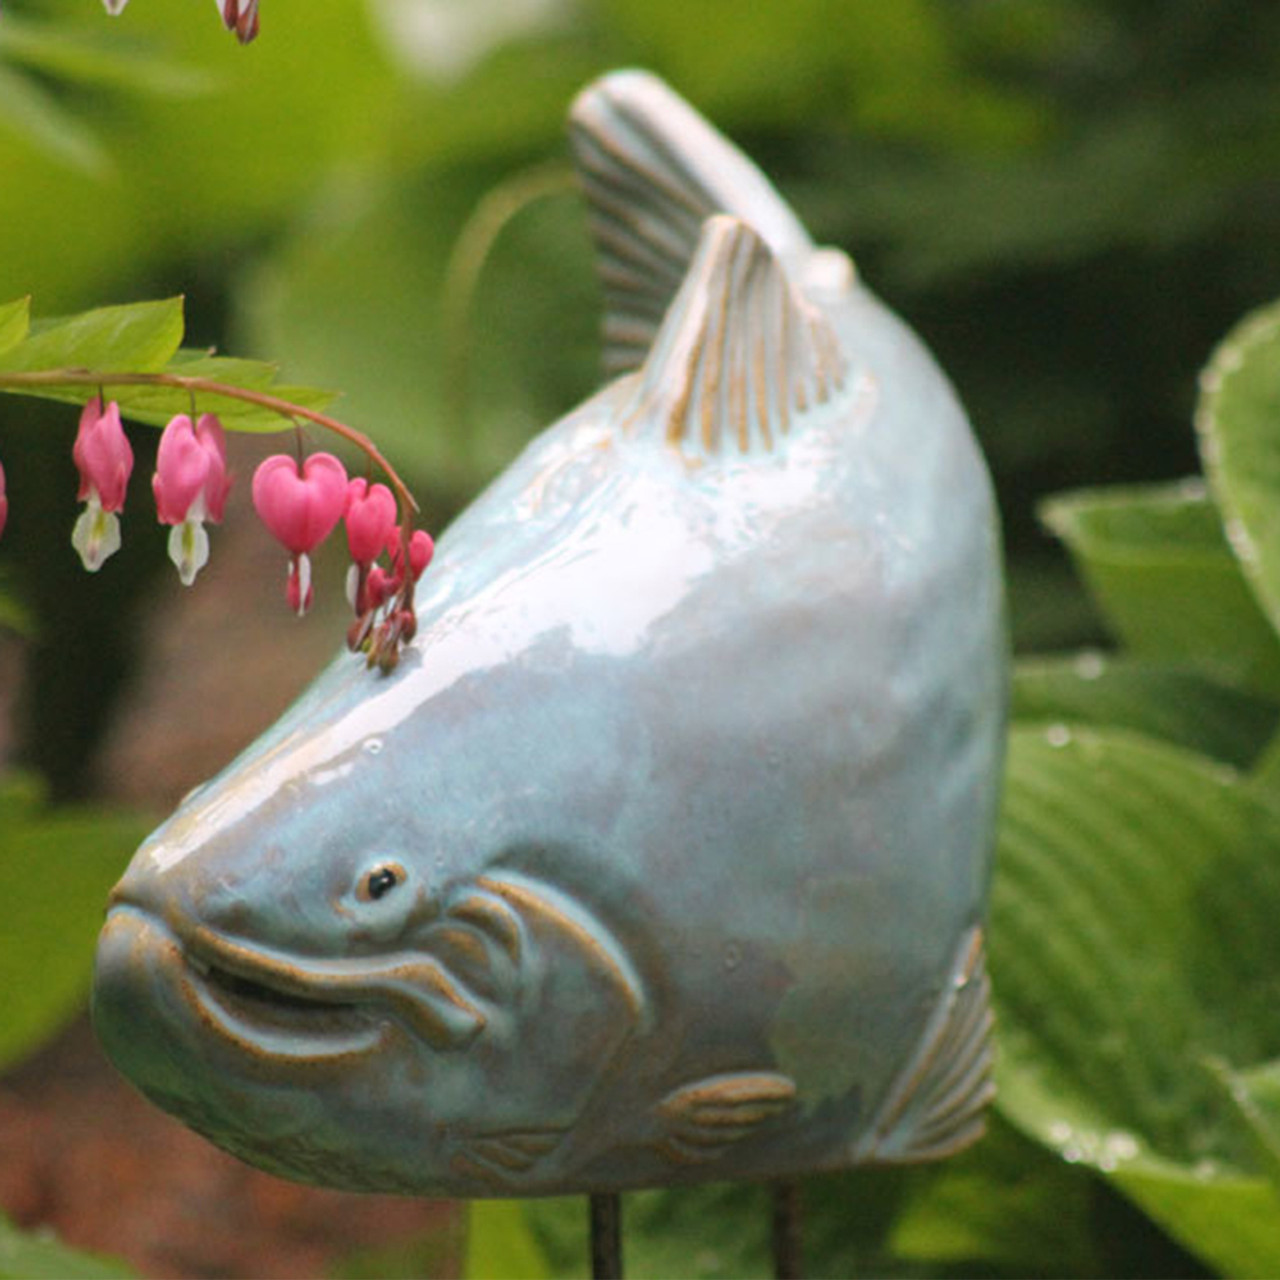 Ceramic Sky Colored Trout Garden Art Statues In Maine